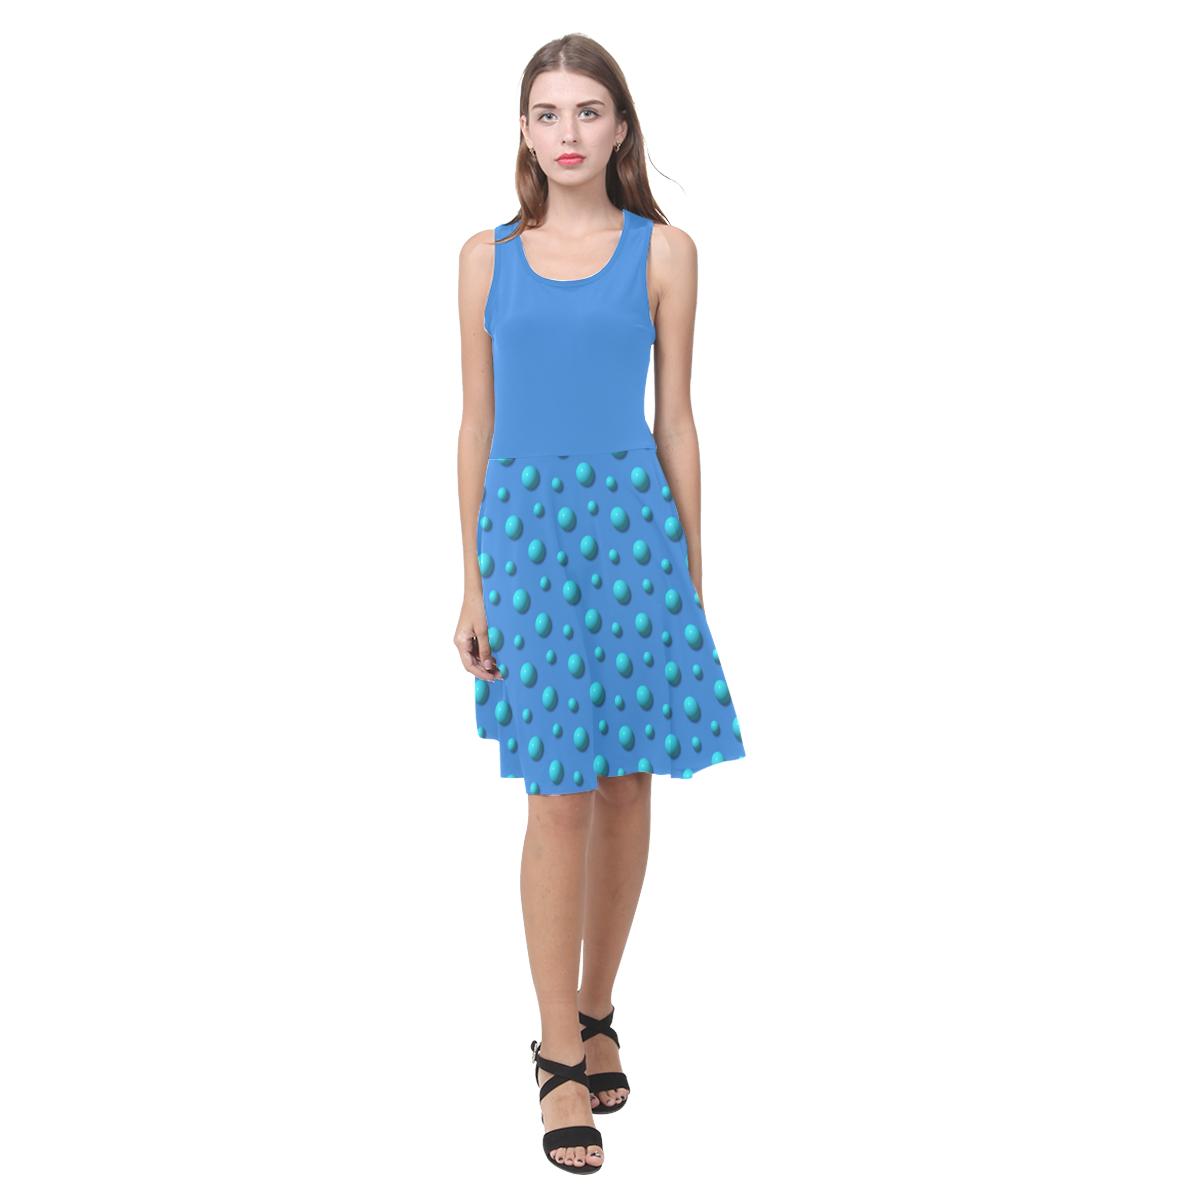 Terrific Turquoise Polka Dots on Beautiful Blue